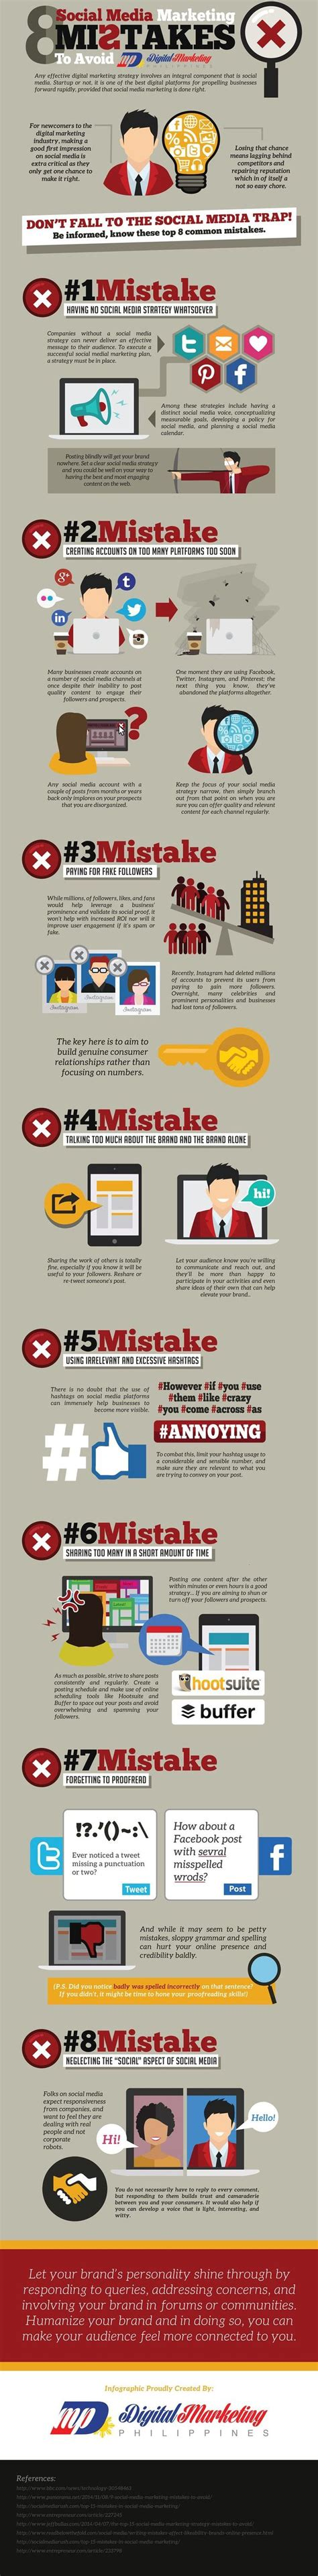 8 errores que deben evitarse en Social Media Marketing ...